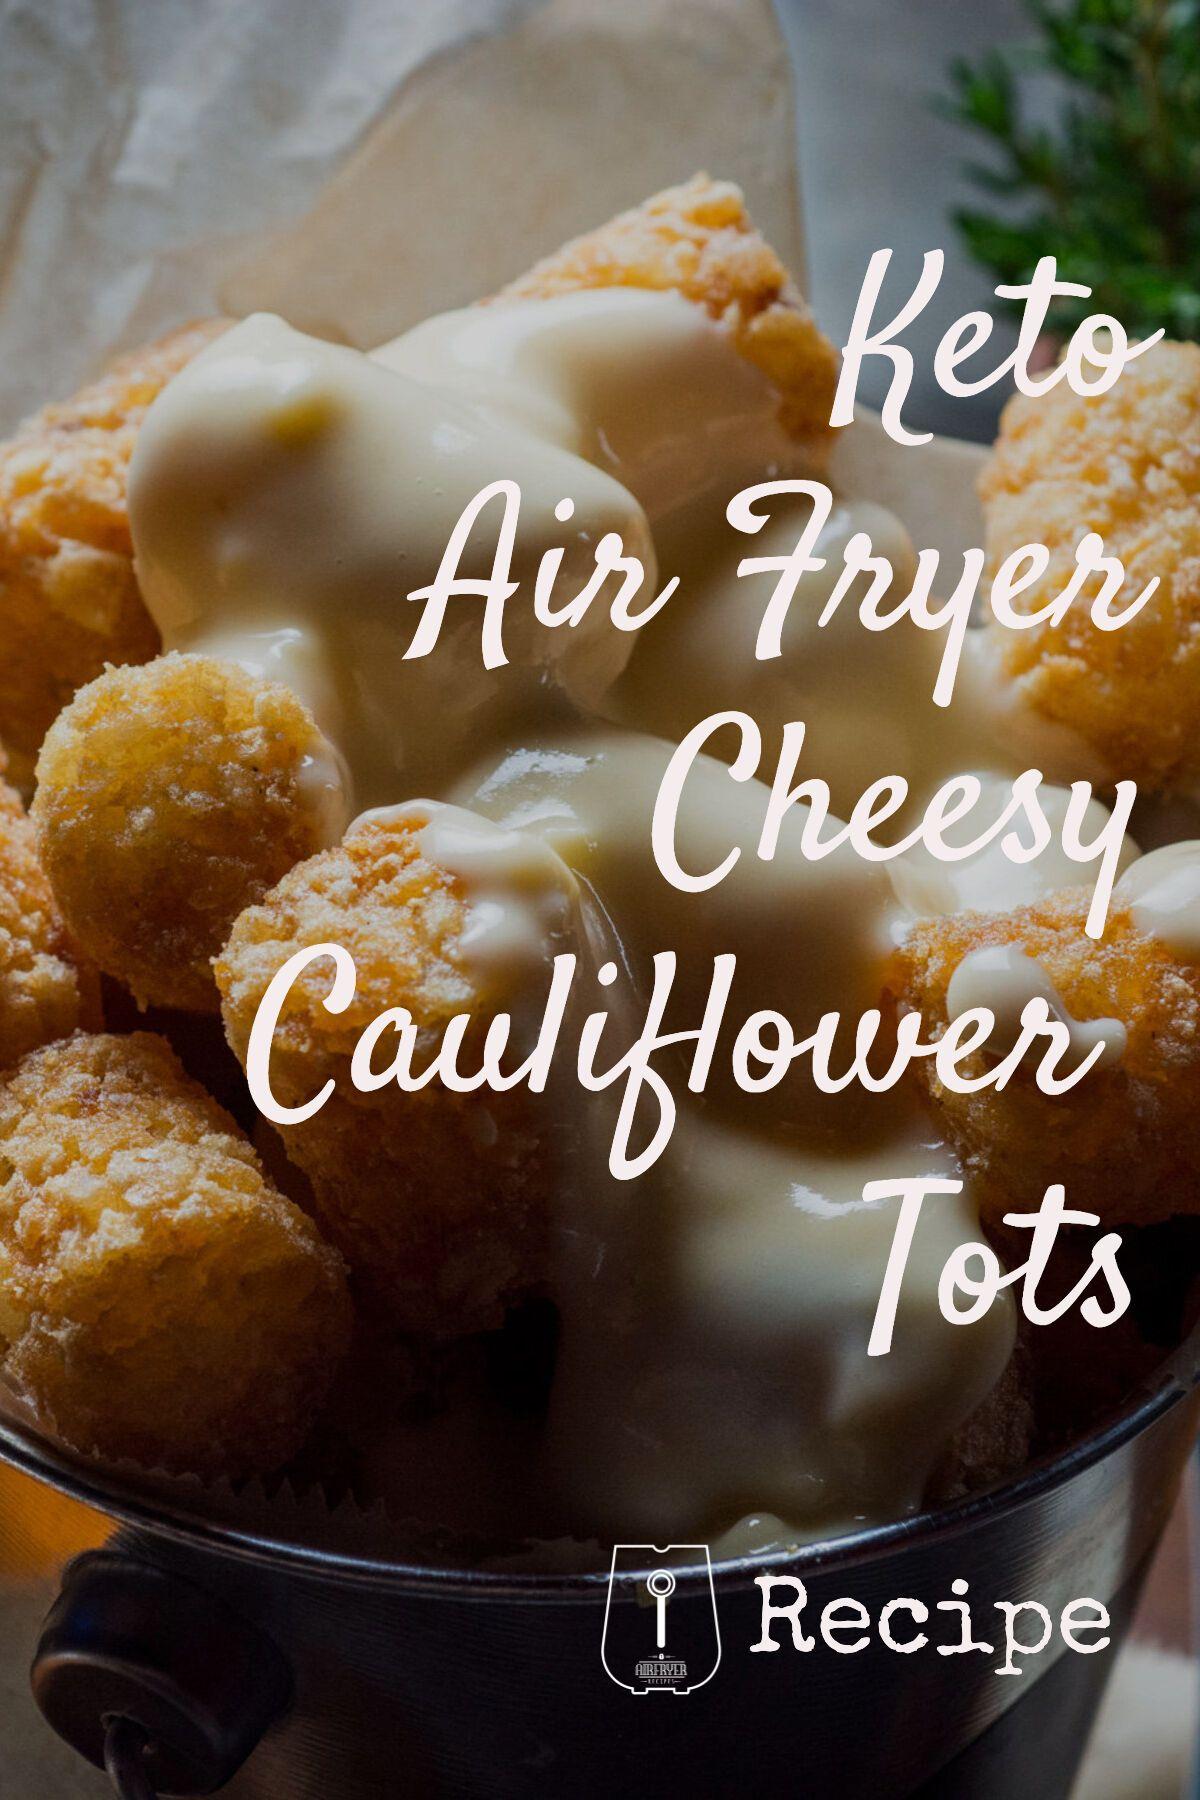 Keto Air Fryer Cheesy Cauliflower Tots Recipe in 2020